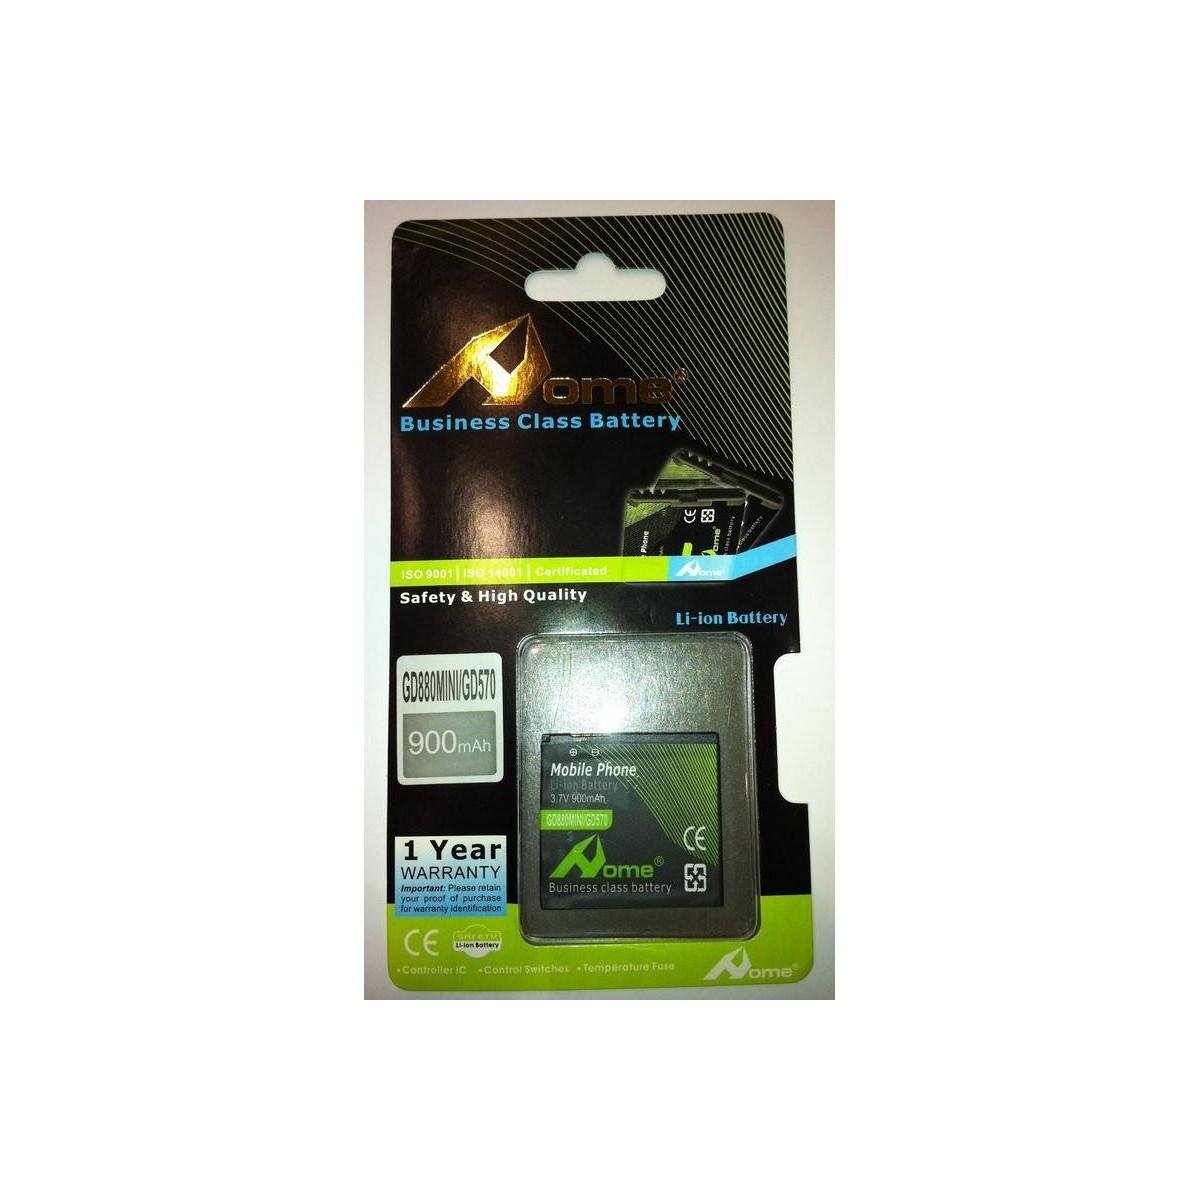 LG GD510 POP, GD880 Mini 900m/Ah DE LARGA DURACION